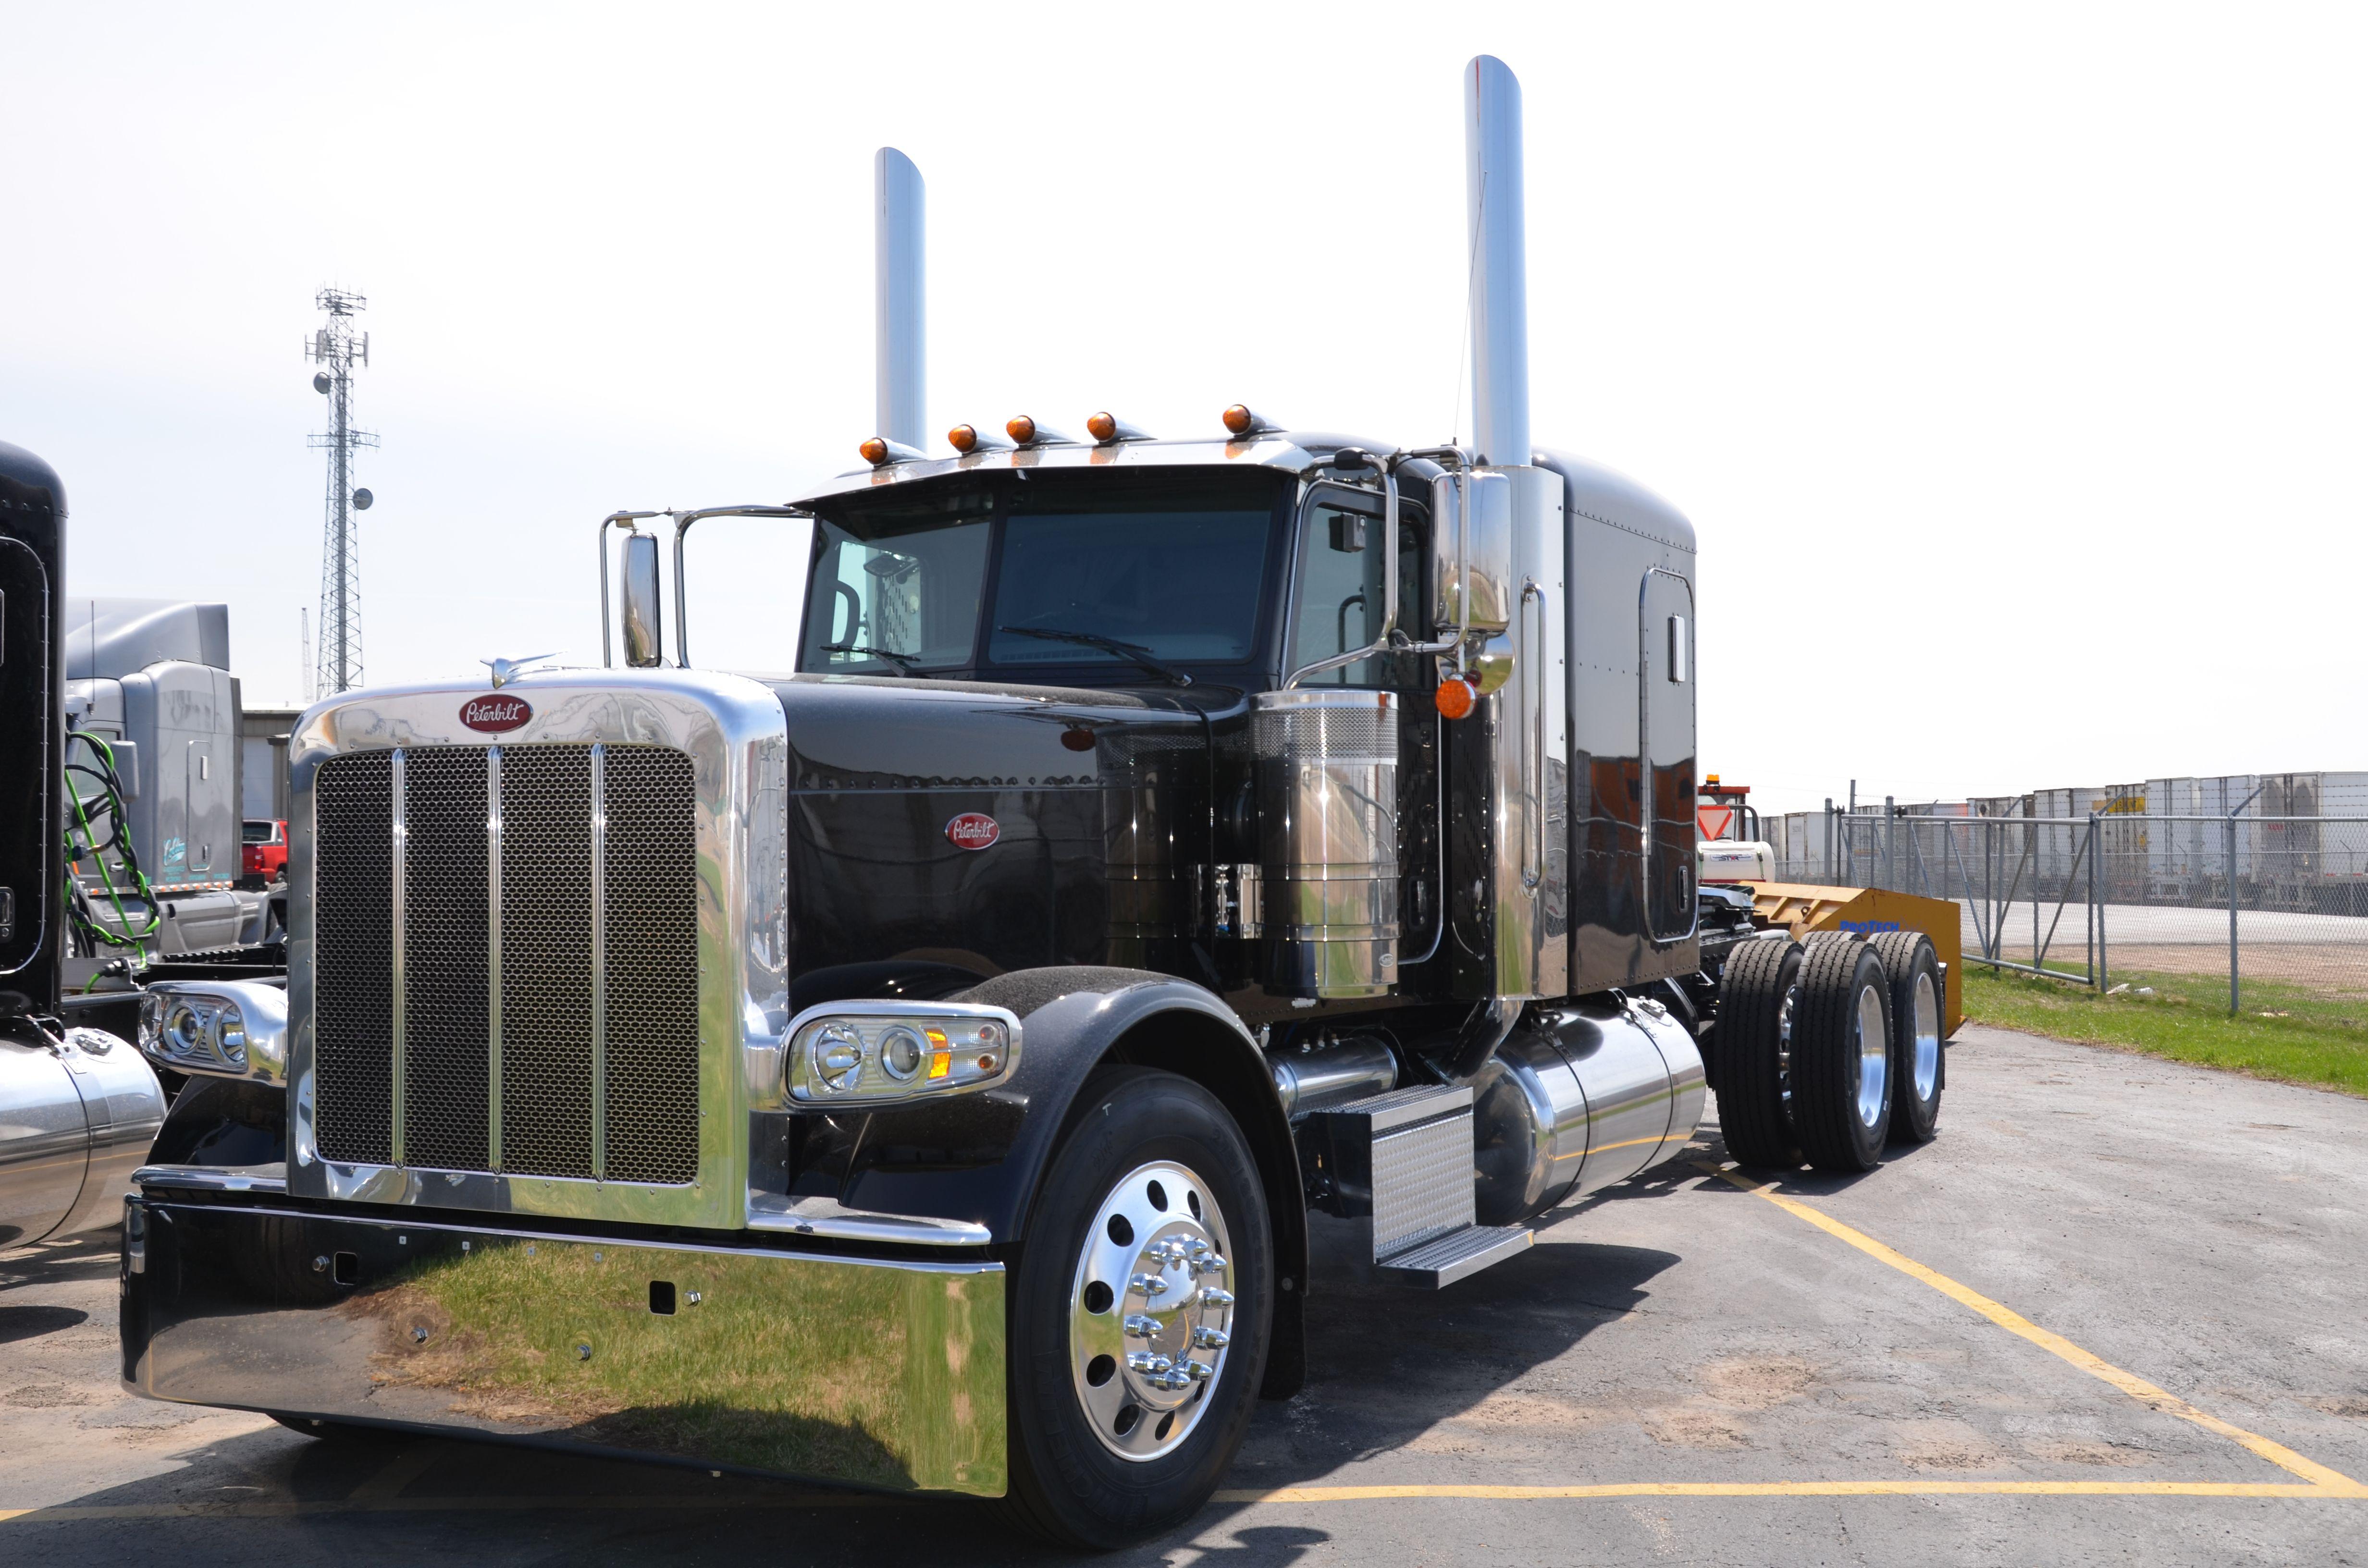 Peterbilt 389 Peterbilt Peterbilt 389 Peterbilt Trucks